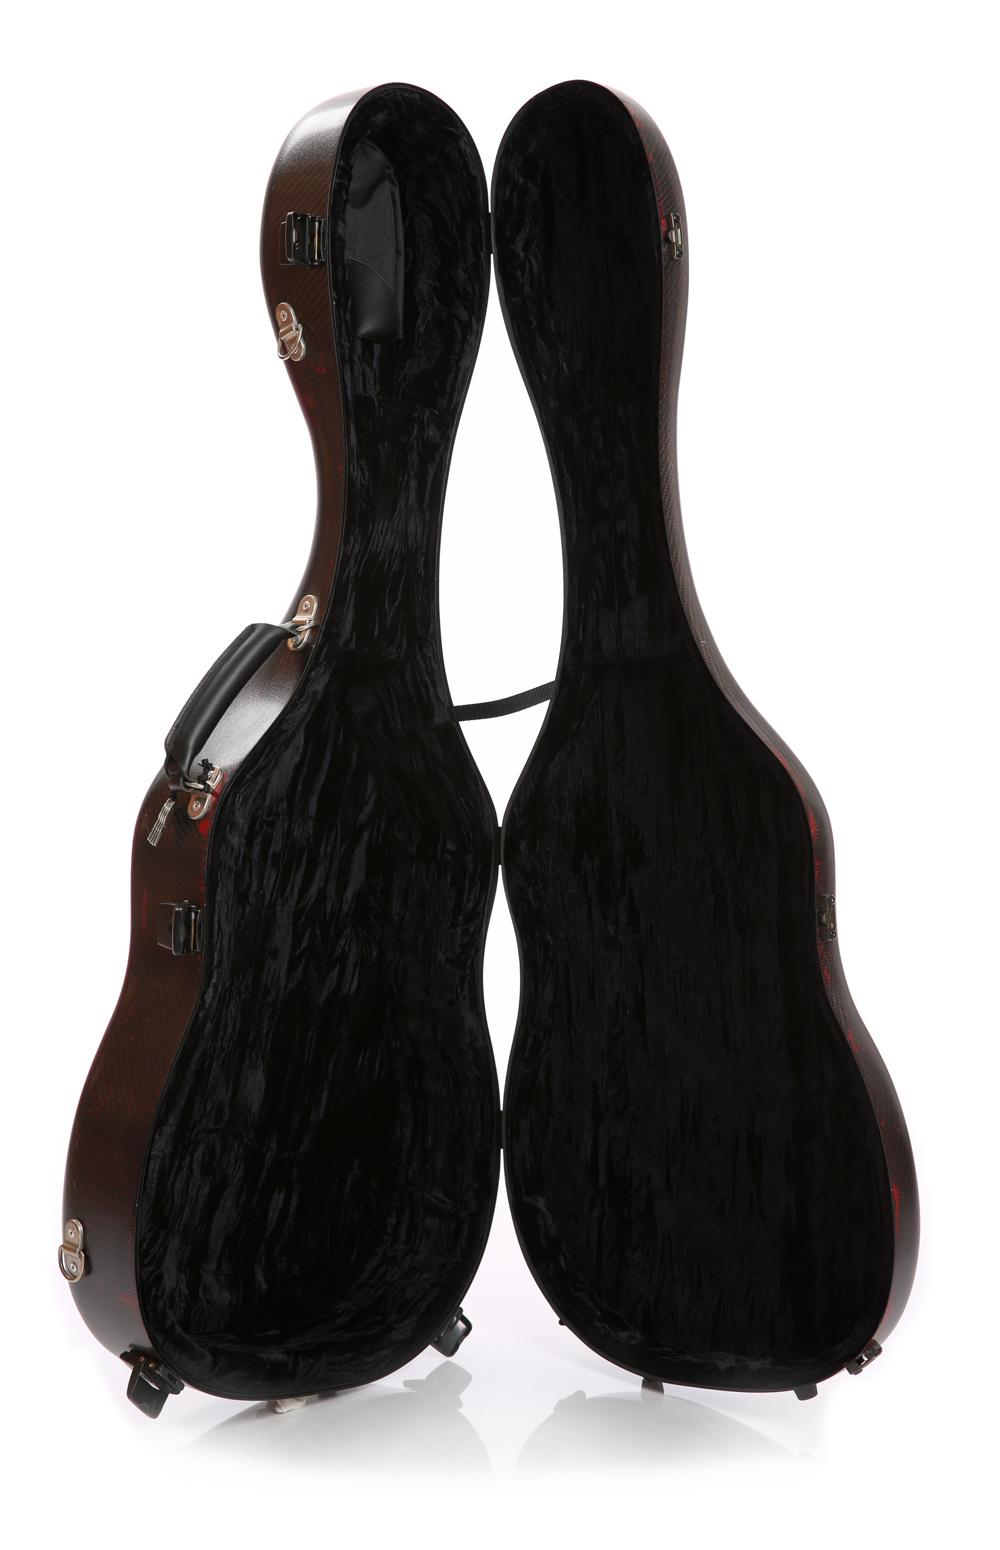 accord guitar case ultralight kevlar carbon cases la sonanta flamenco. Black Bedroom Furniture Sets. Home Design Ideas